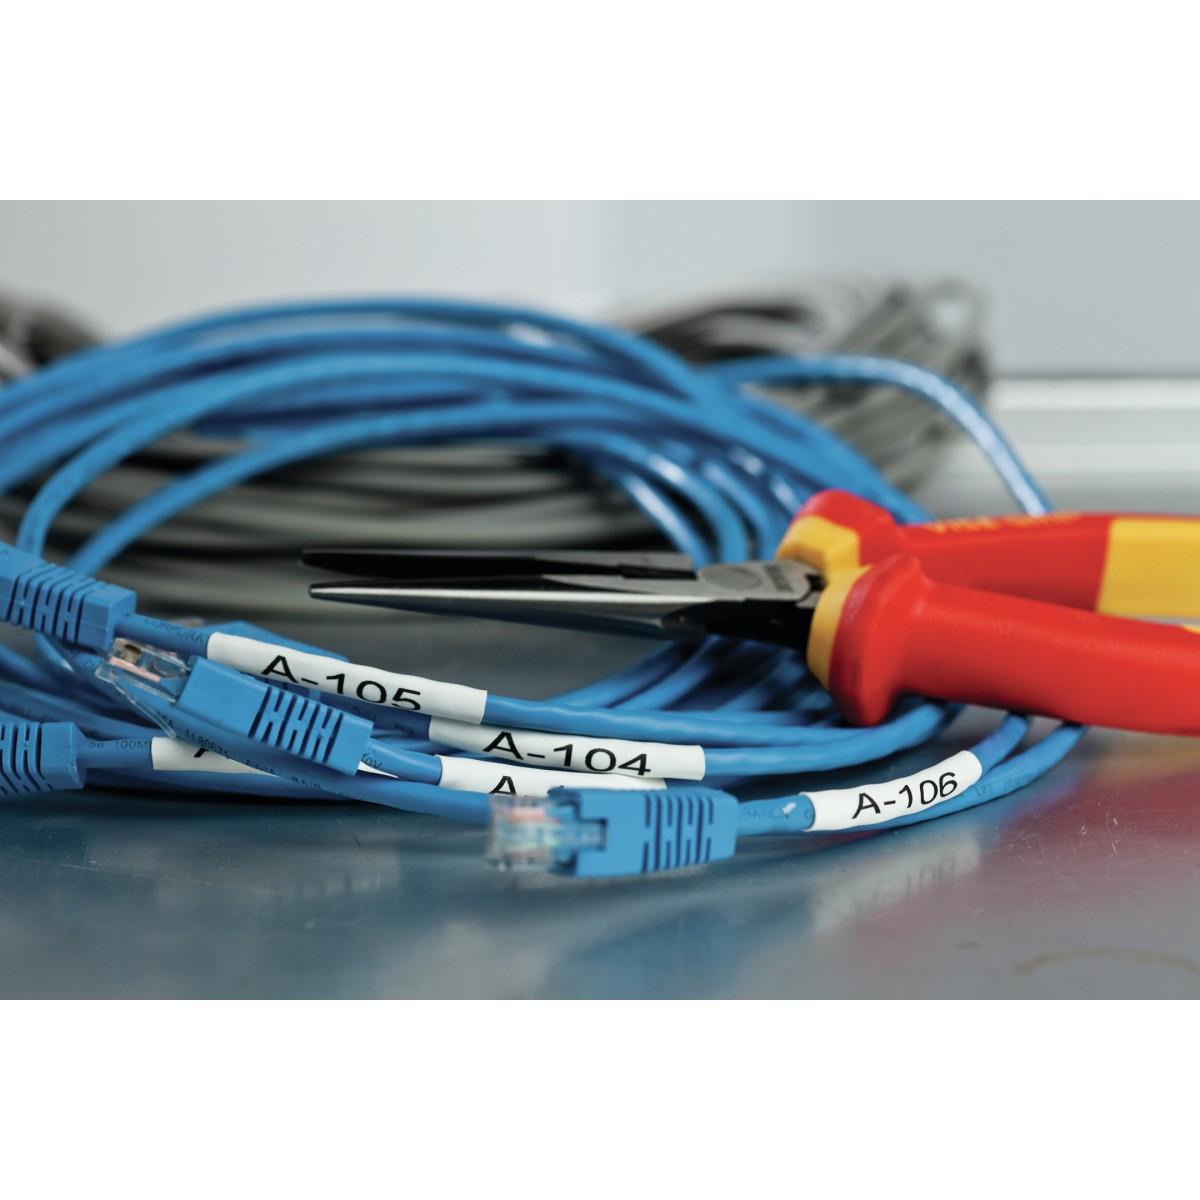 Dymo Rhino Pro 5200 label printer S0841460. Save/recall >100 label ...